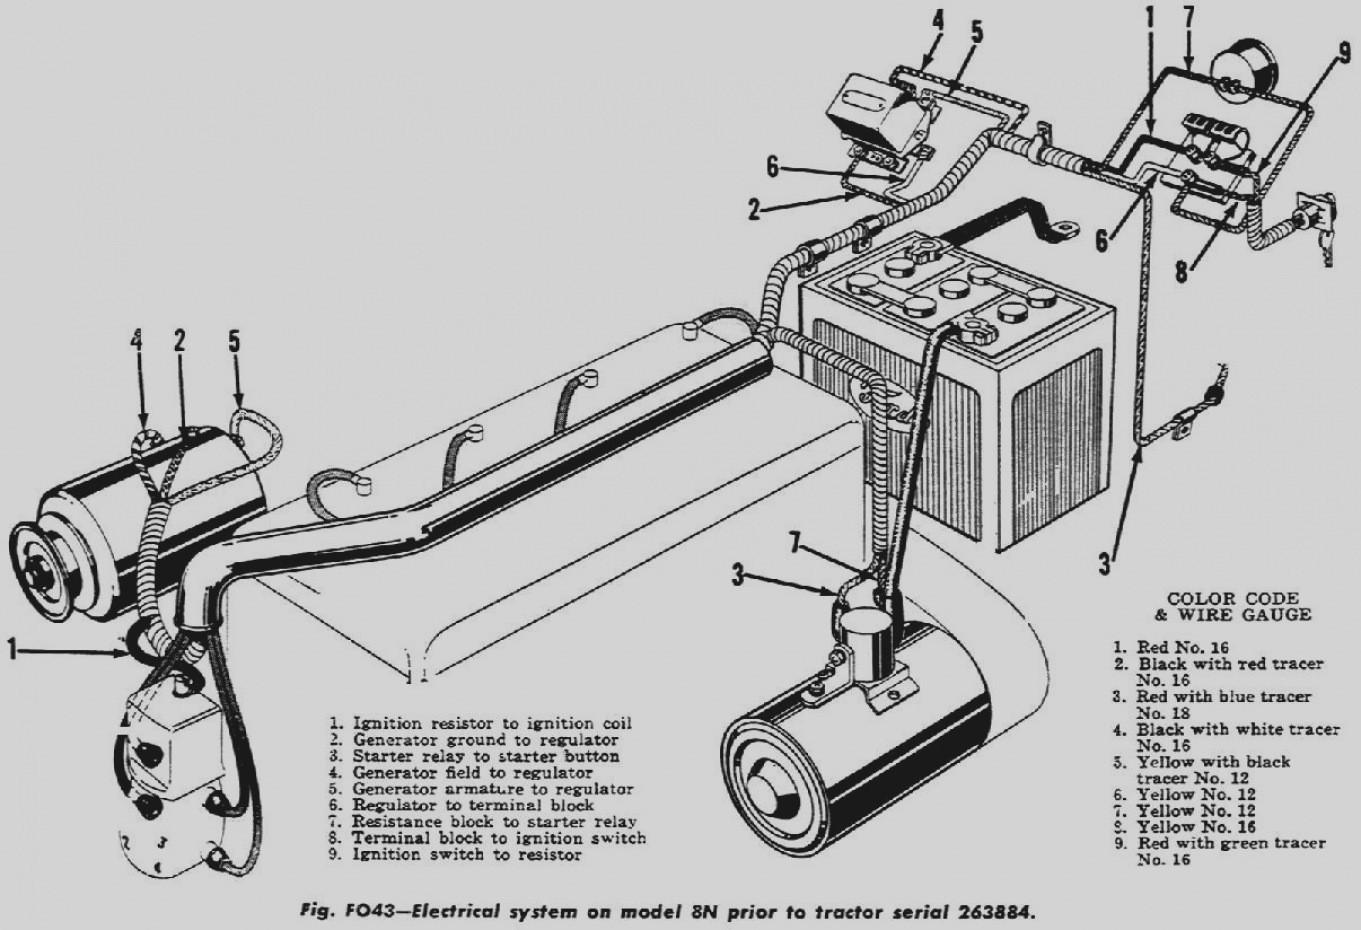 1952 ford 8n 12 volt wiring diagram xv 5290  side mount distributor 8n ford tractor 8n ford tractor  side mount distributor 8n ford tractor